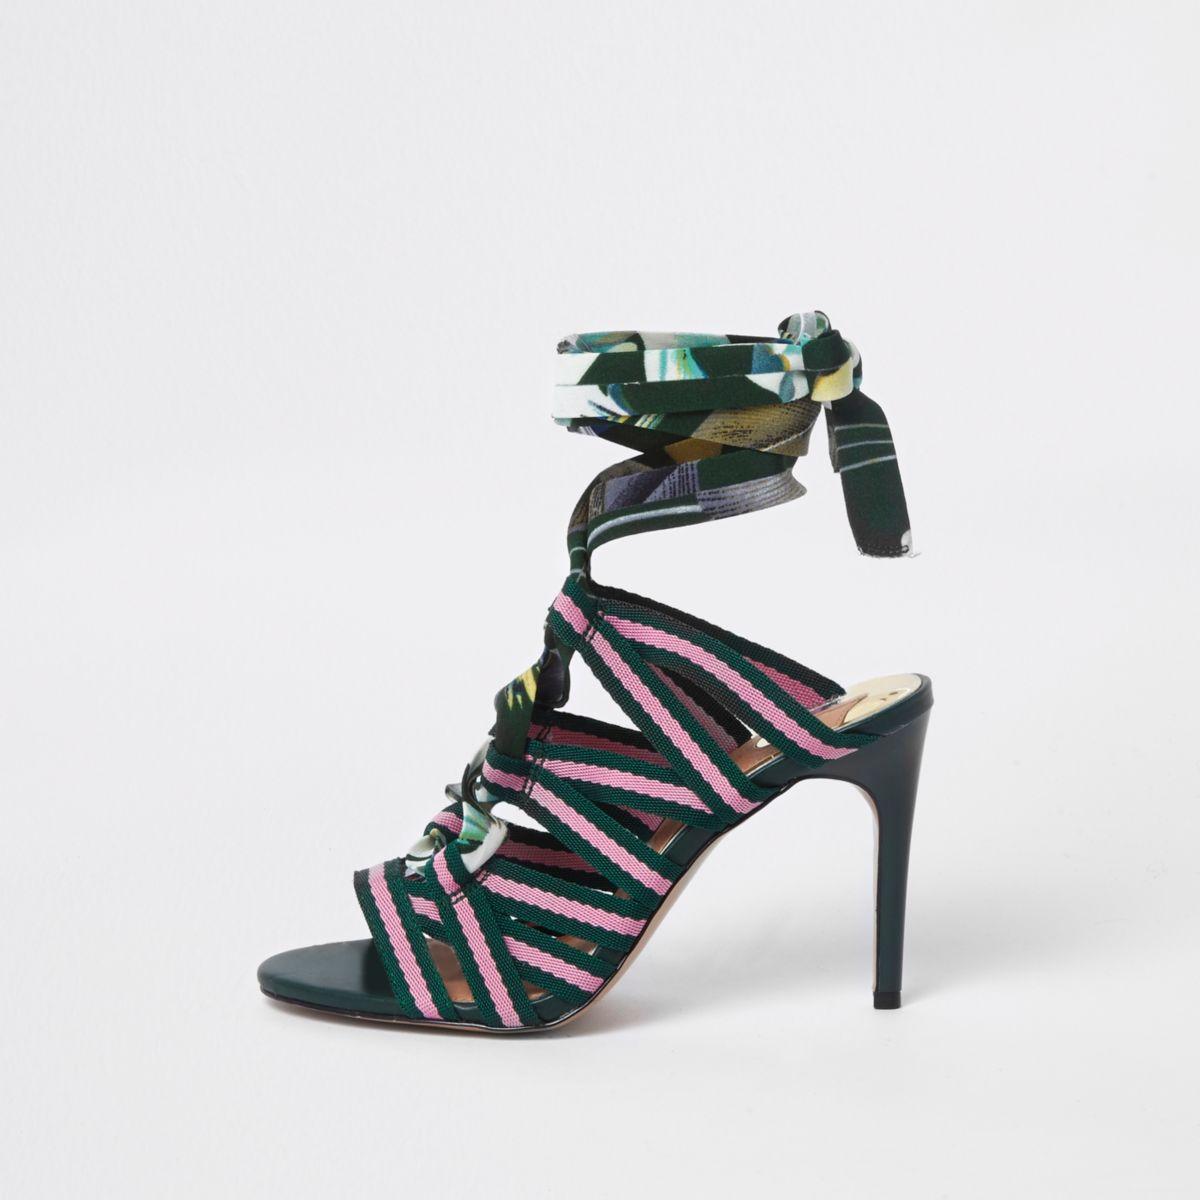 River Island Sandals - green